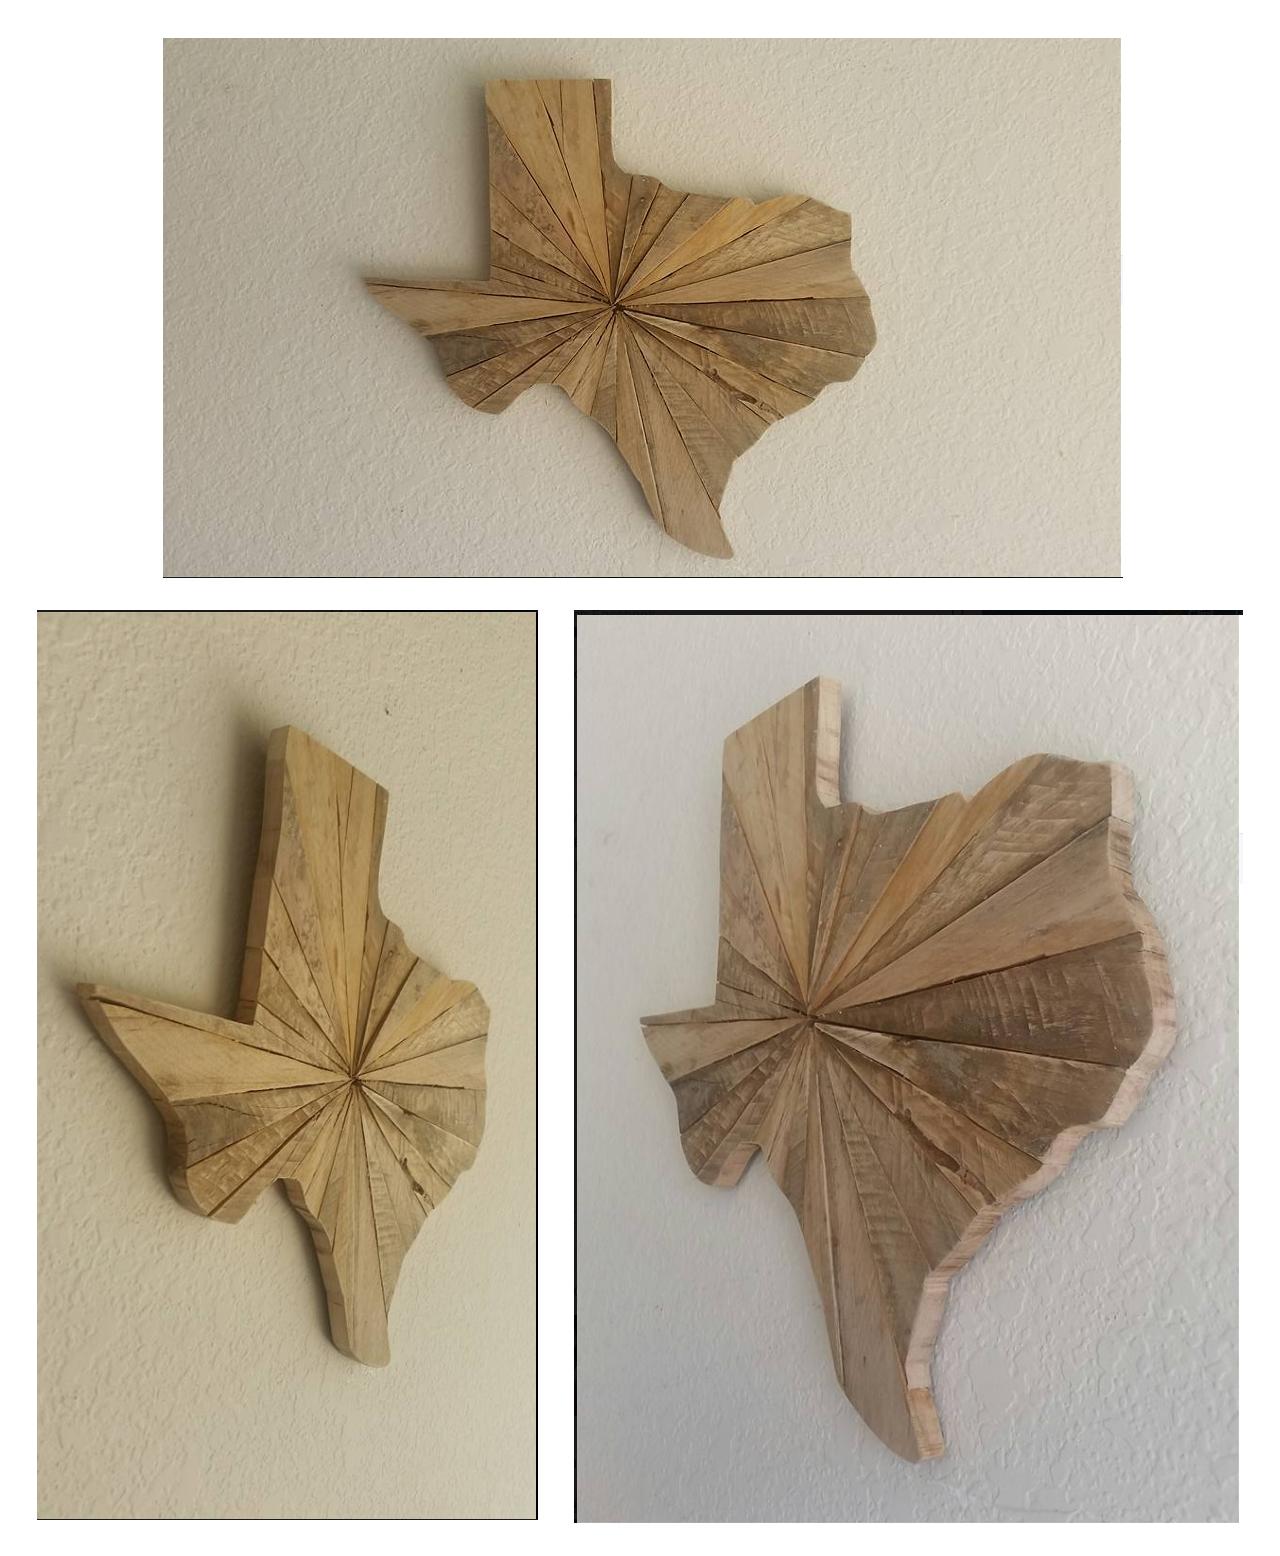 Texas Wall Art sunburst cut wooden texas wall artgensanity on deviantart